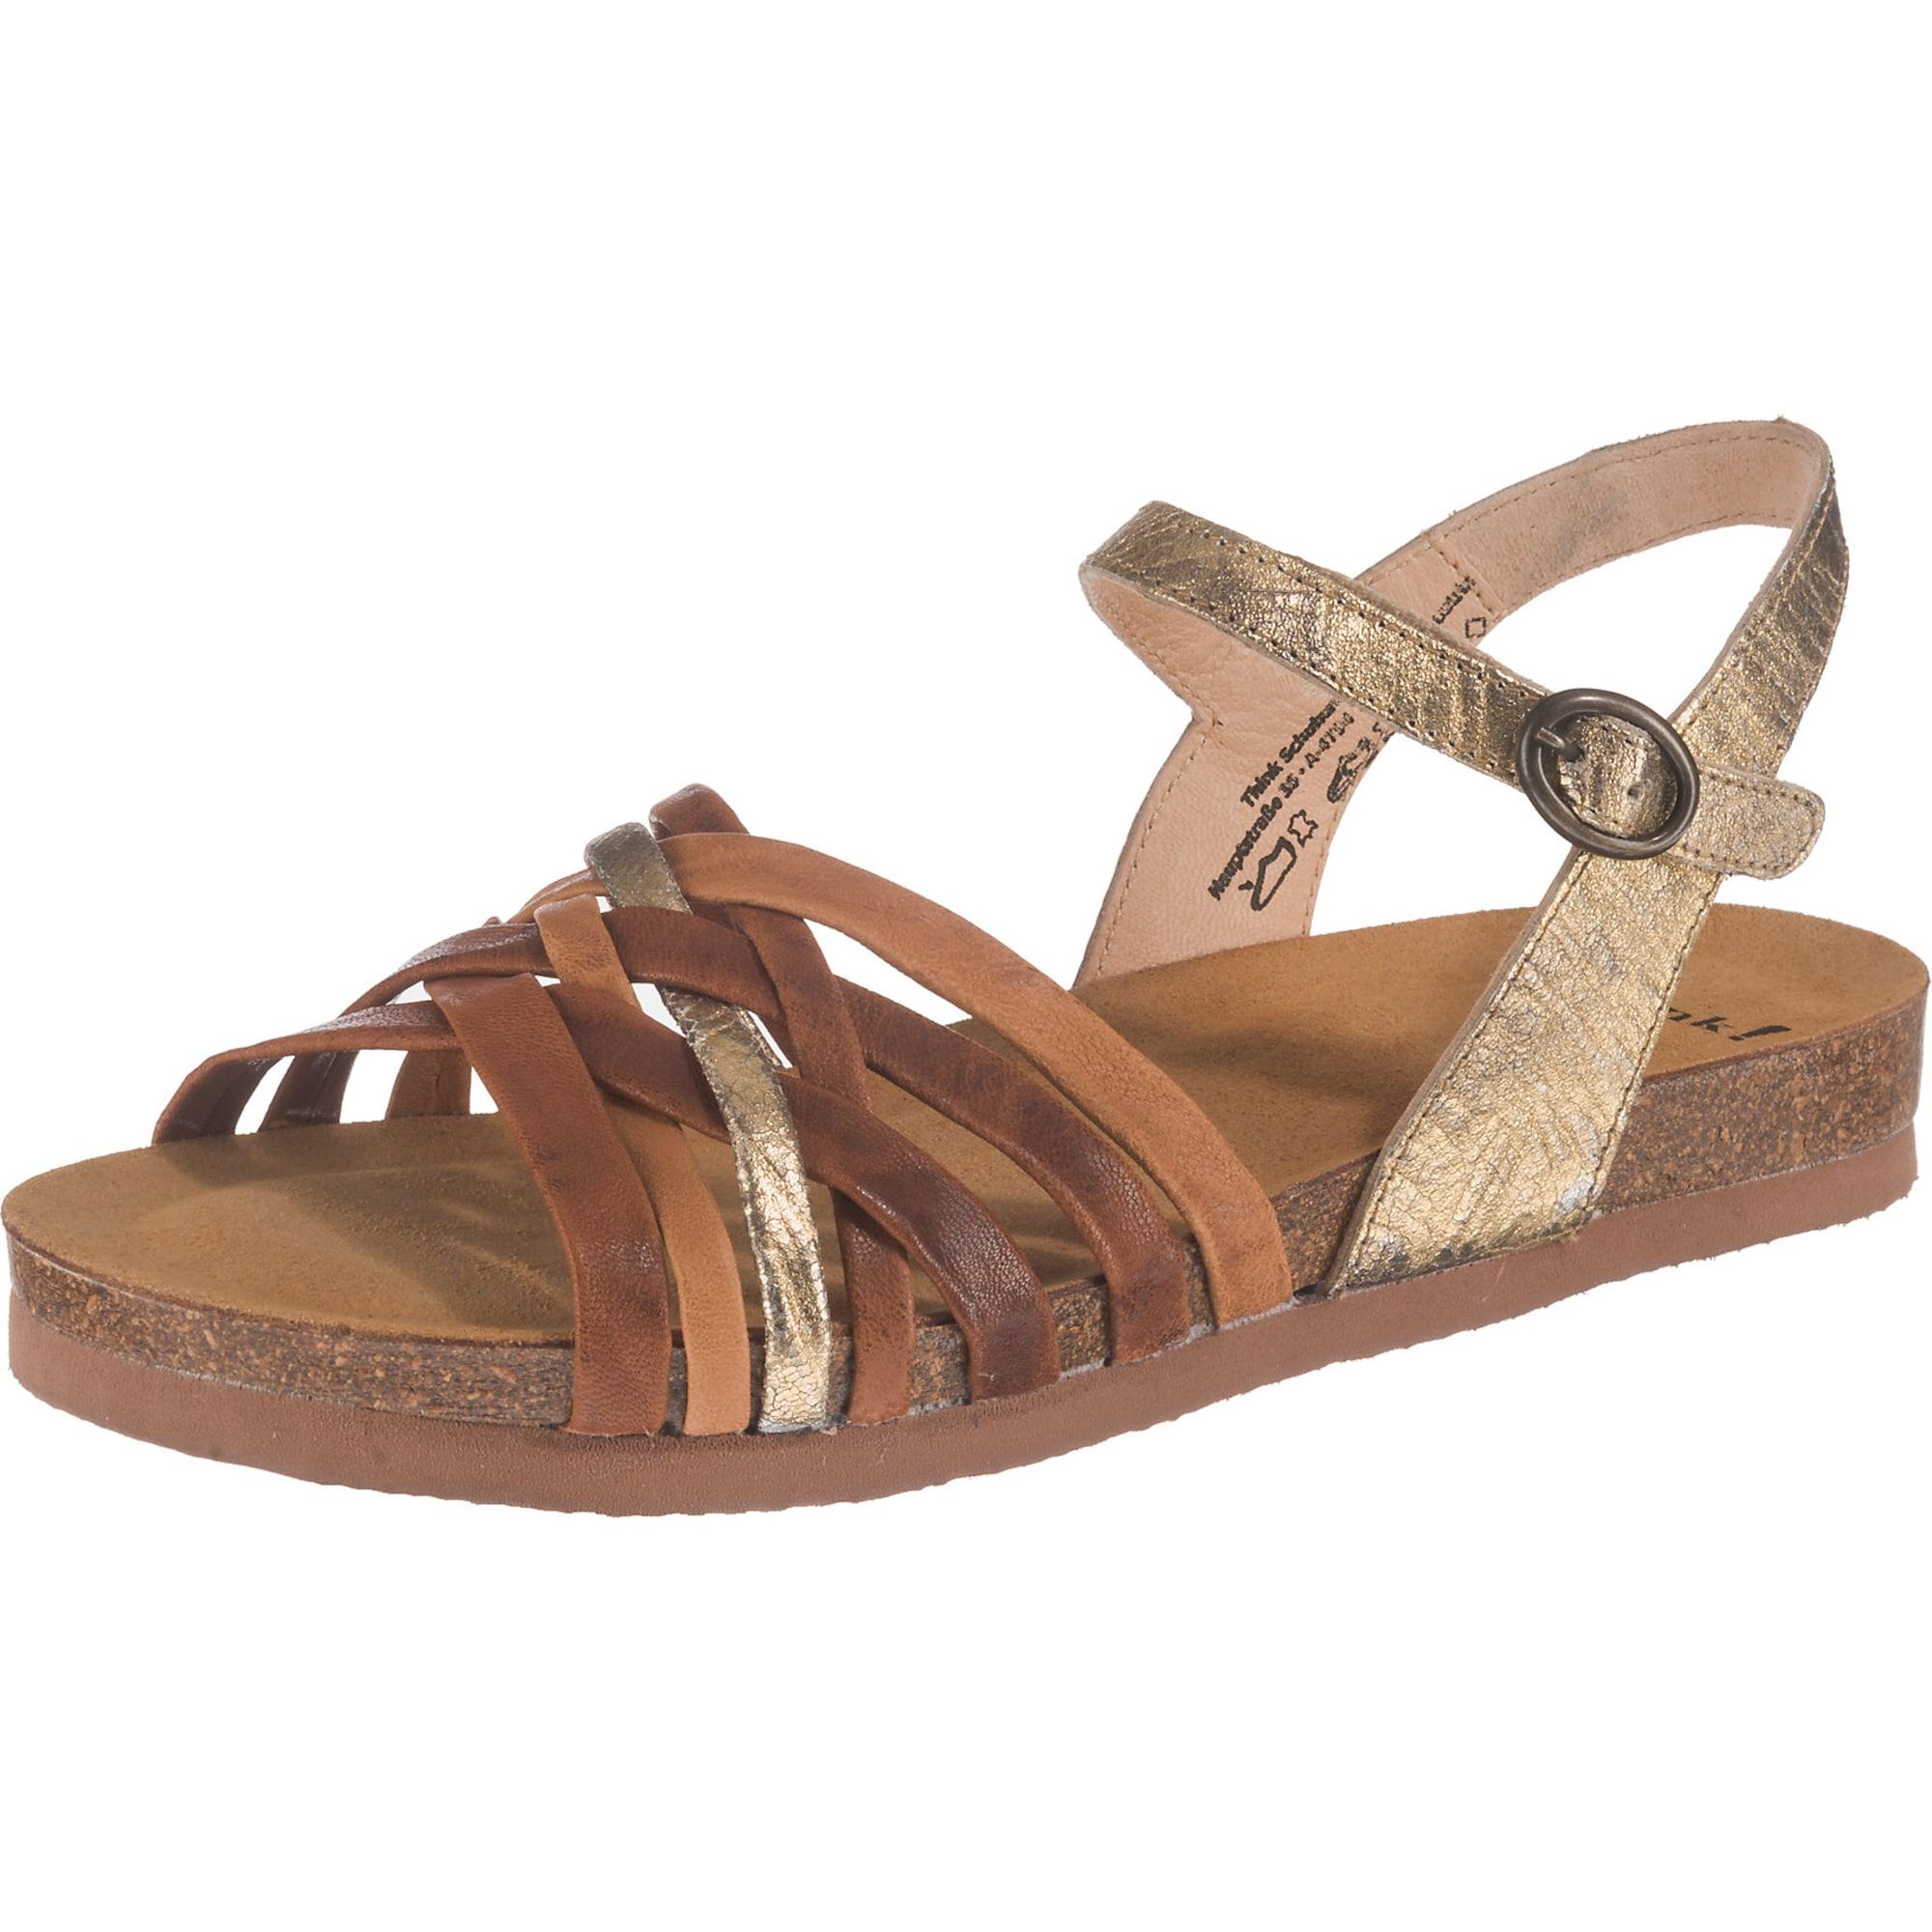 Sandalen 'Shik' | Schuhe > Sandalen & Zehentrenner > Sandalen | THINK!